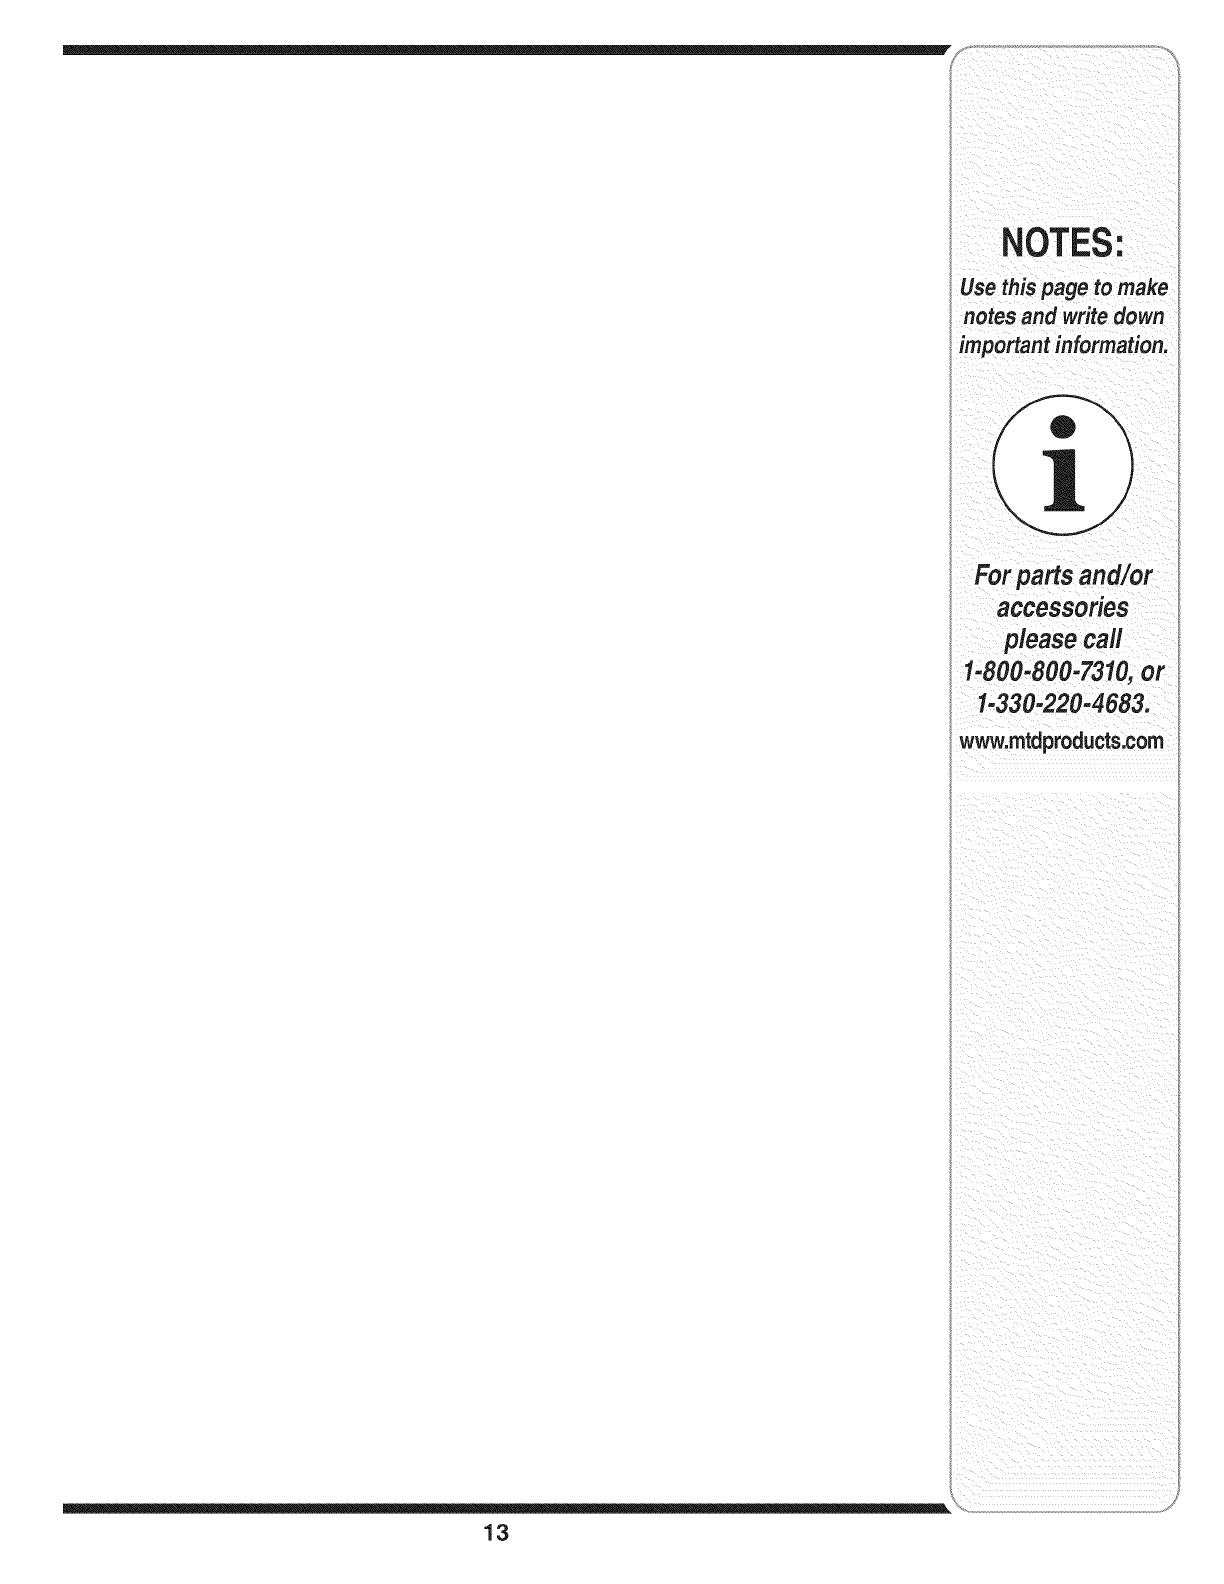 MTD 24A 462G729 User Manual CHIPPER/SHREDDER Manuals And